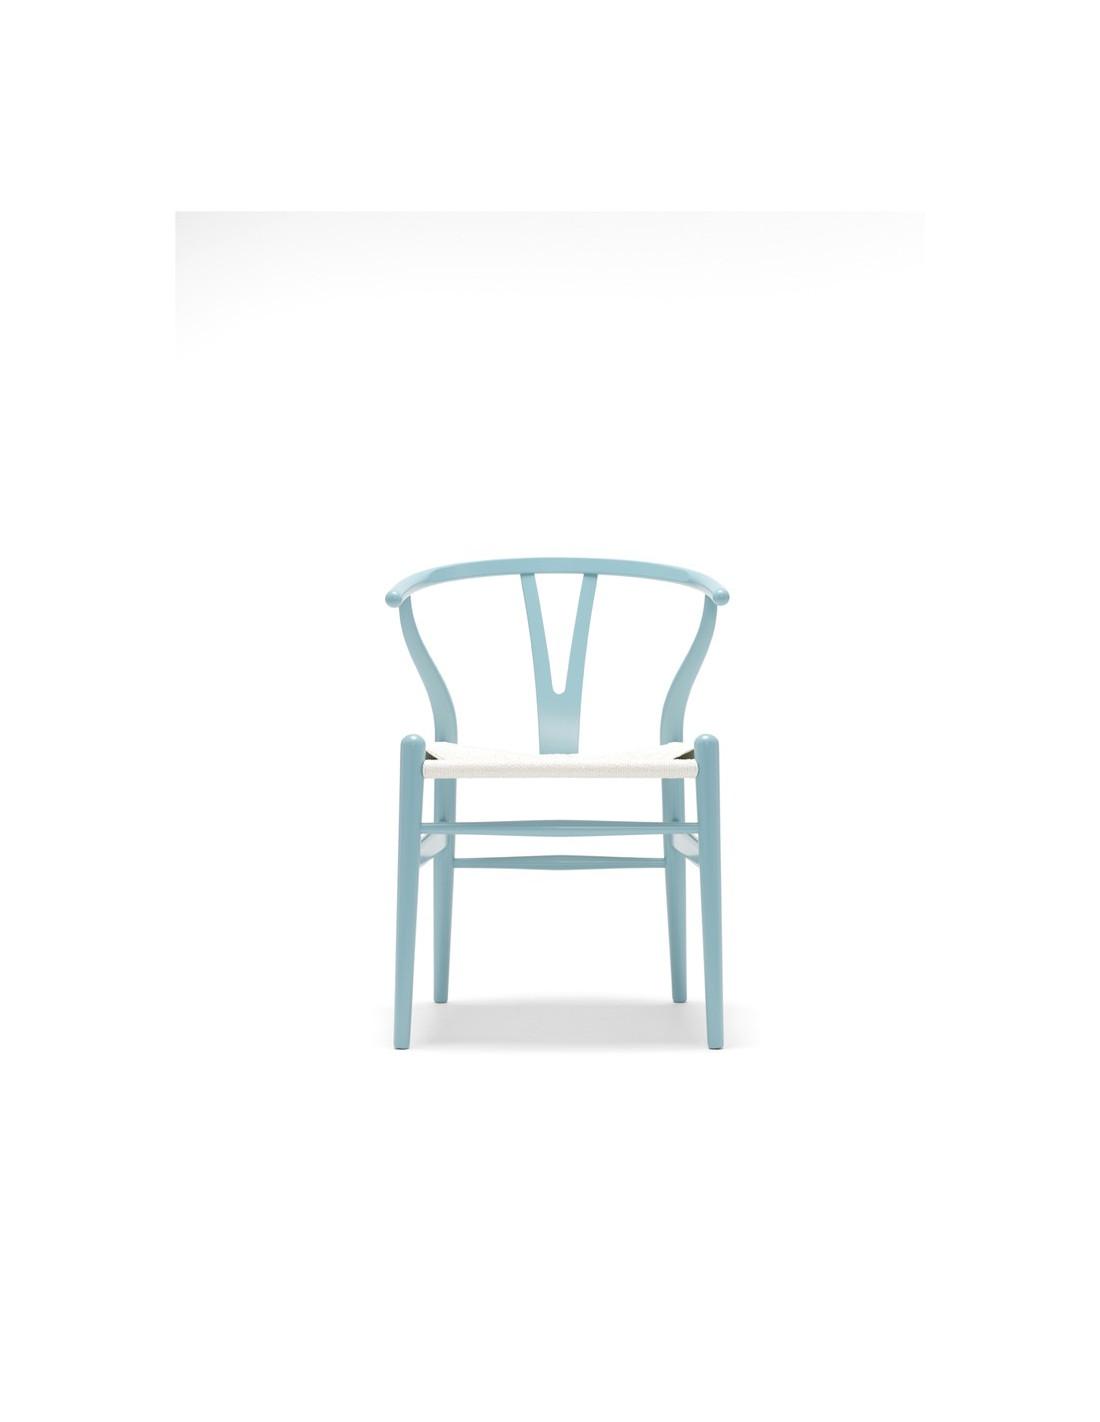 ch24 wishbone chair hans wegner design for carl hansen la boutique danoise. Black Bedroom Furniture Sets. Home Design Ideas